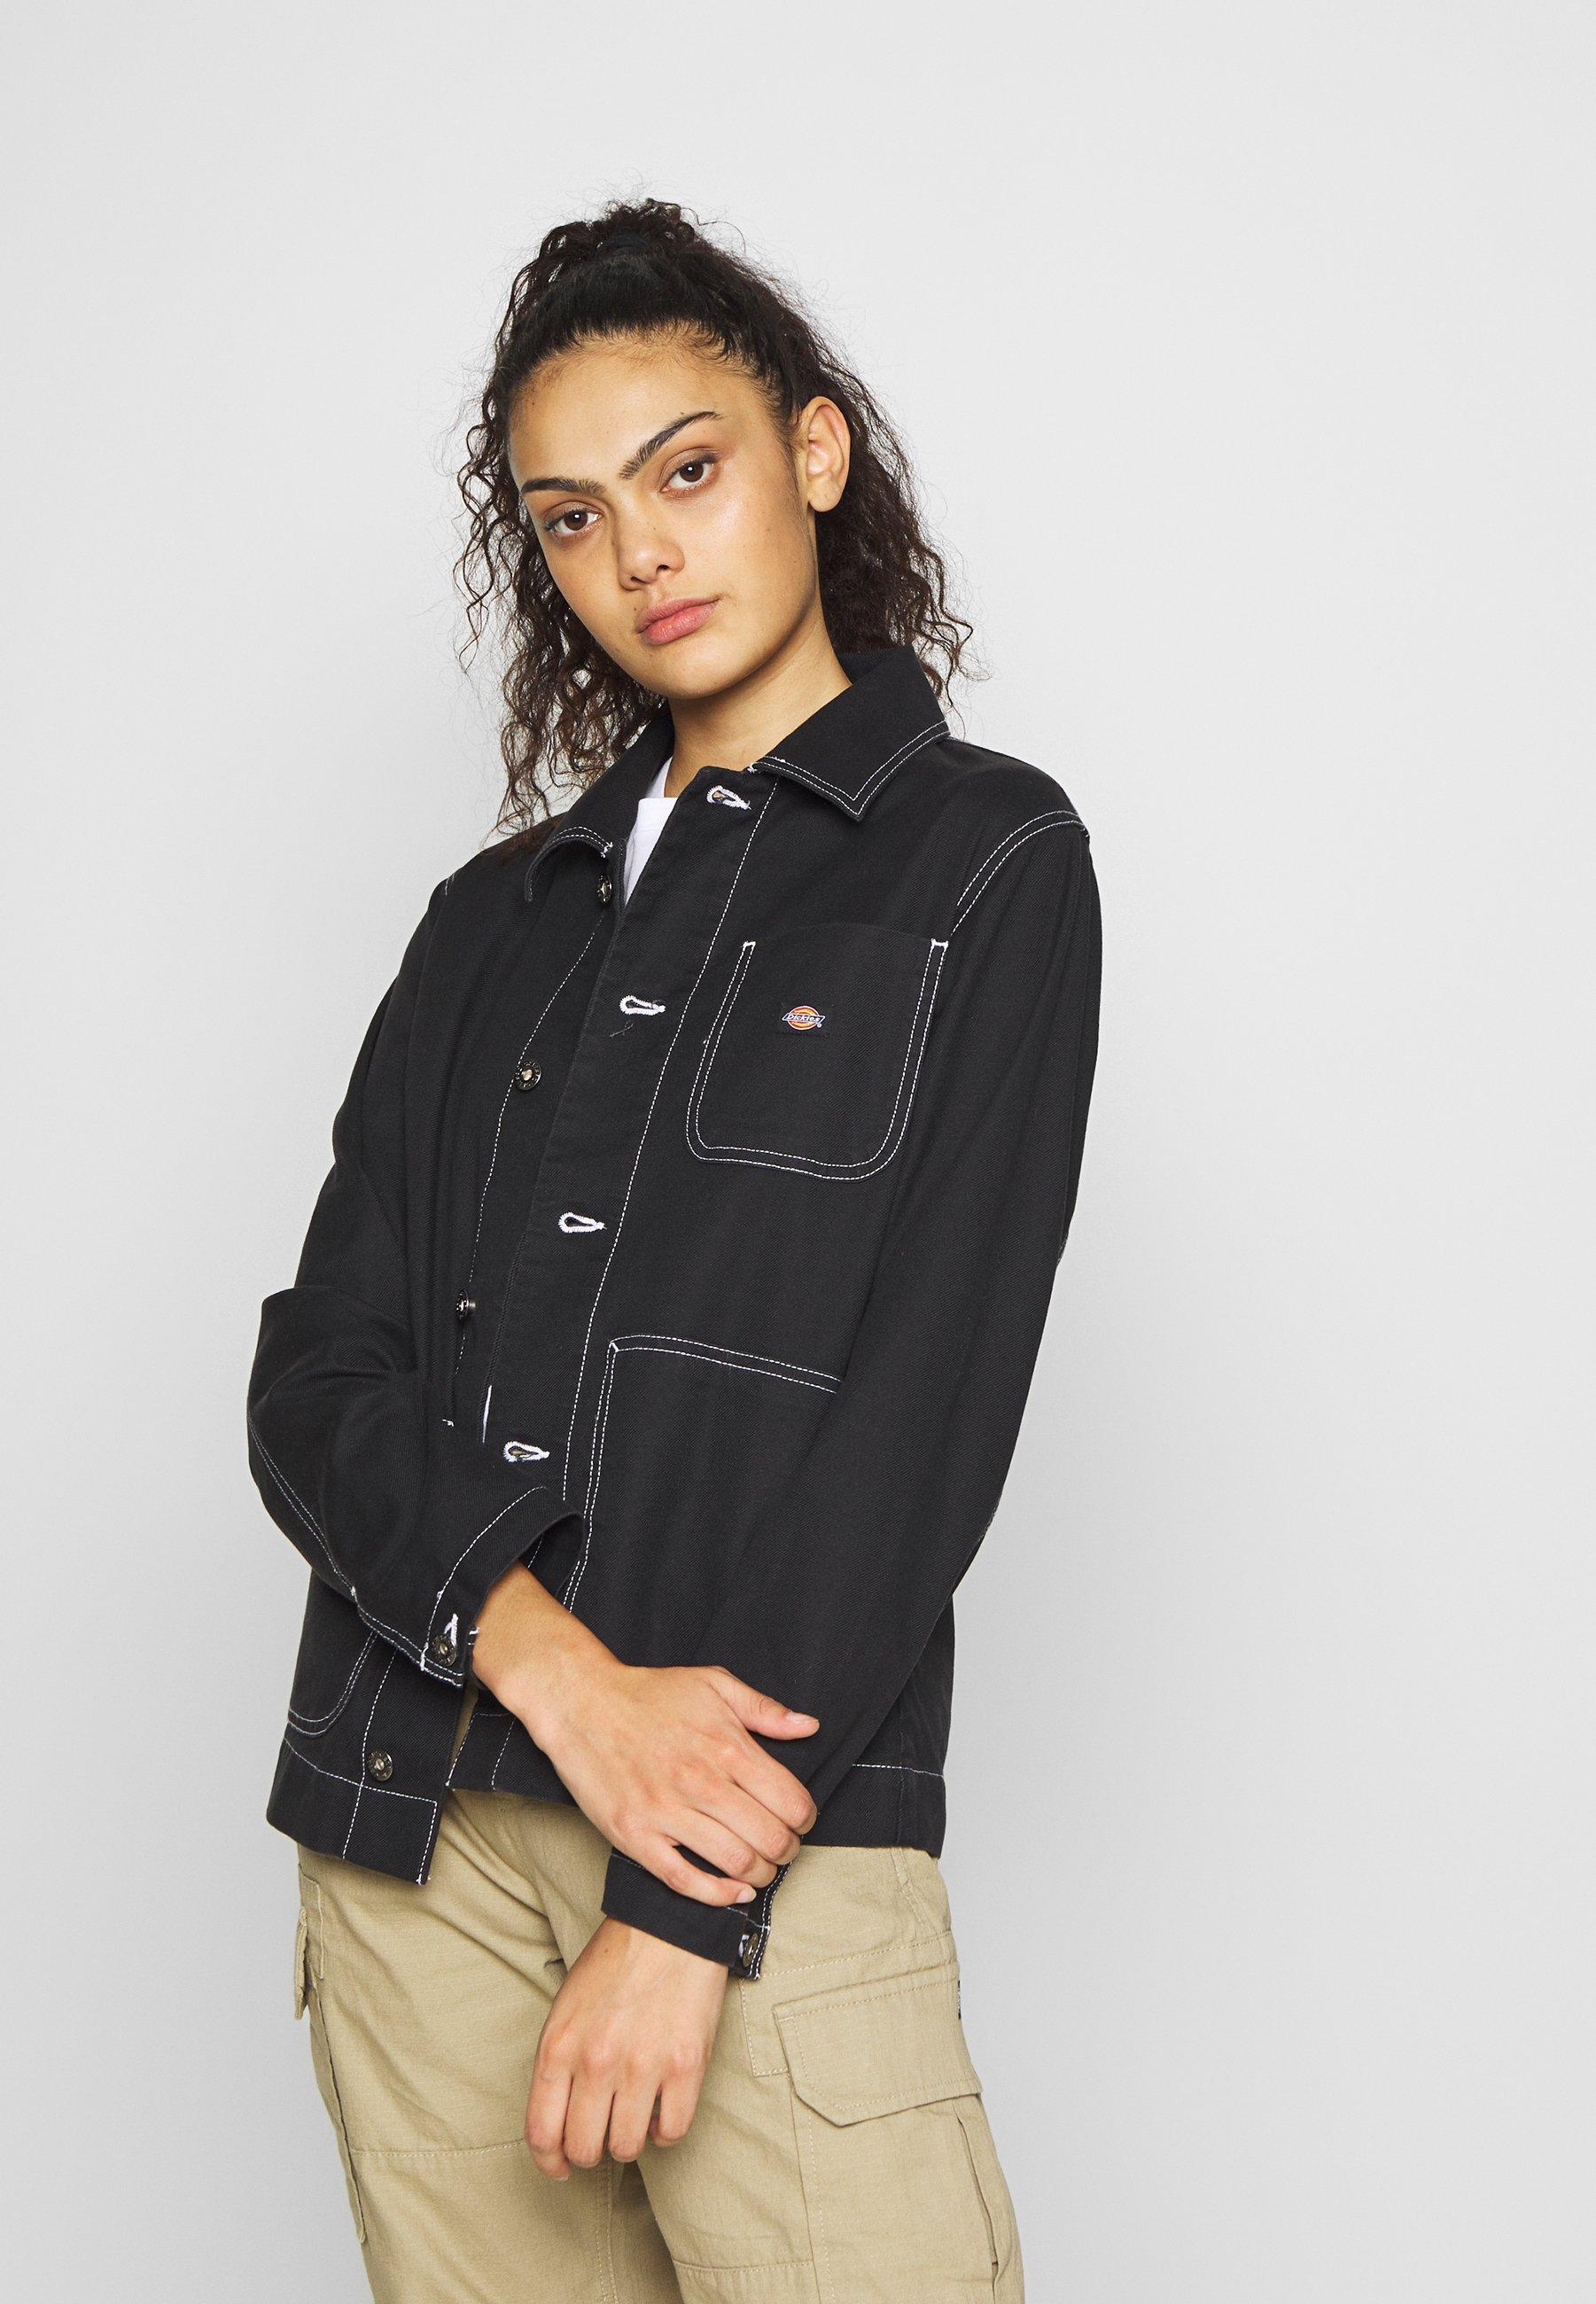 100% Guaranteed Inexpensive Women's Clothing Dickies TOCCOA Denim jacket black iweDXJGNA 5uqQTDqk1